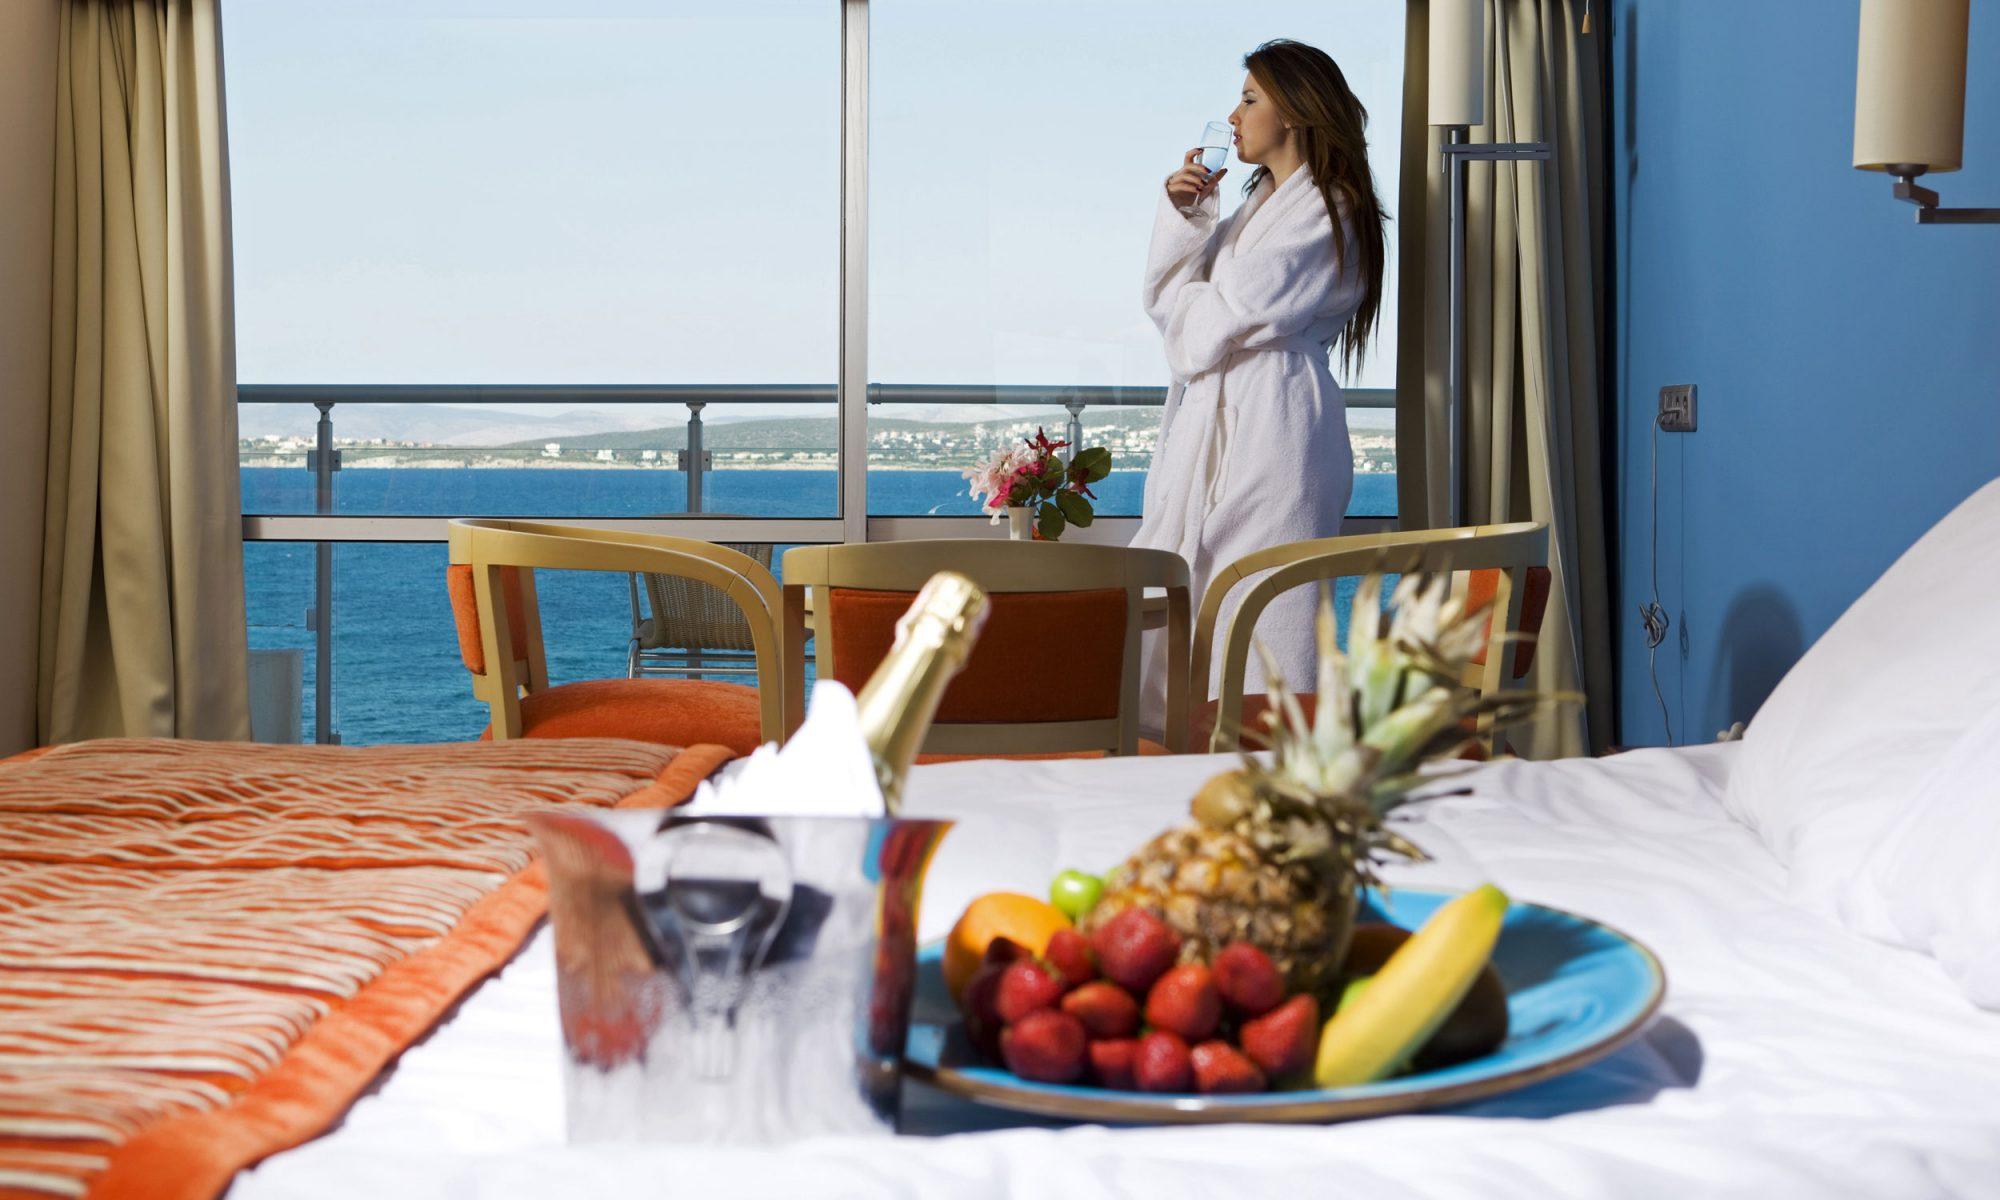 EC: An Affair with Hotel Breakfast